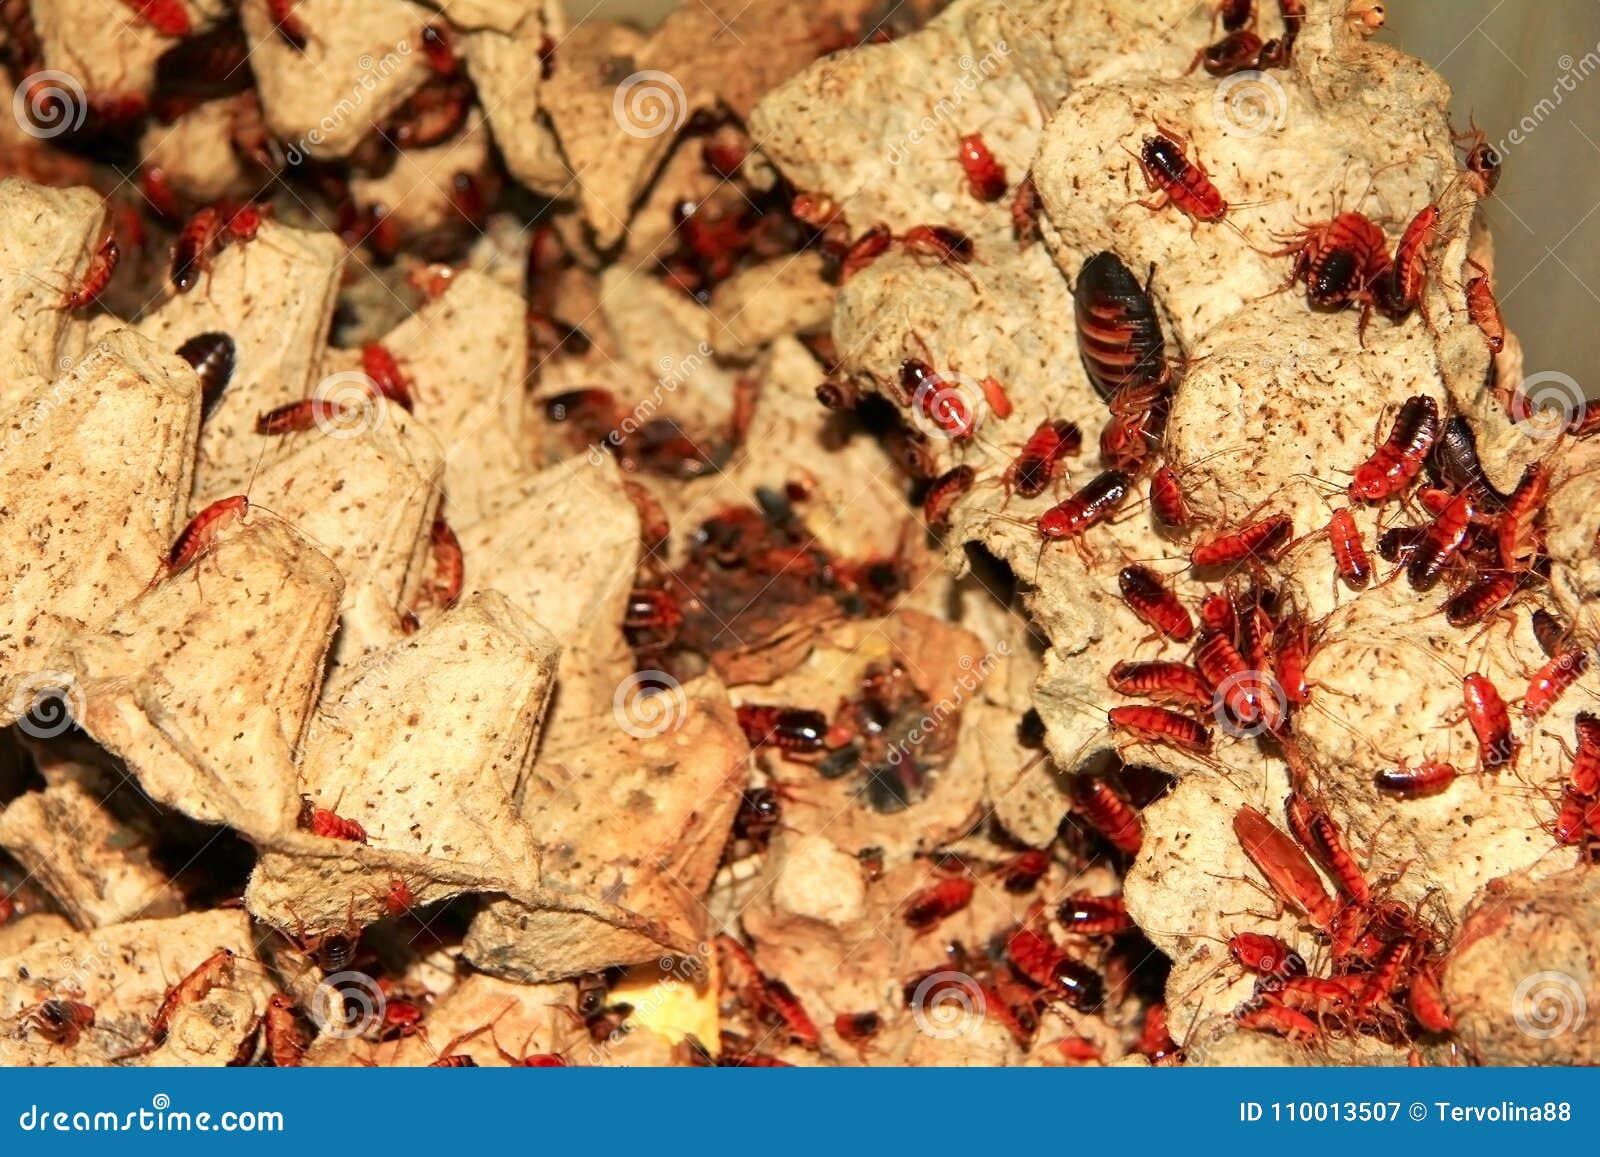 A great deal rode kakkerlakken